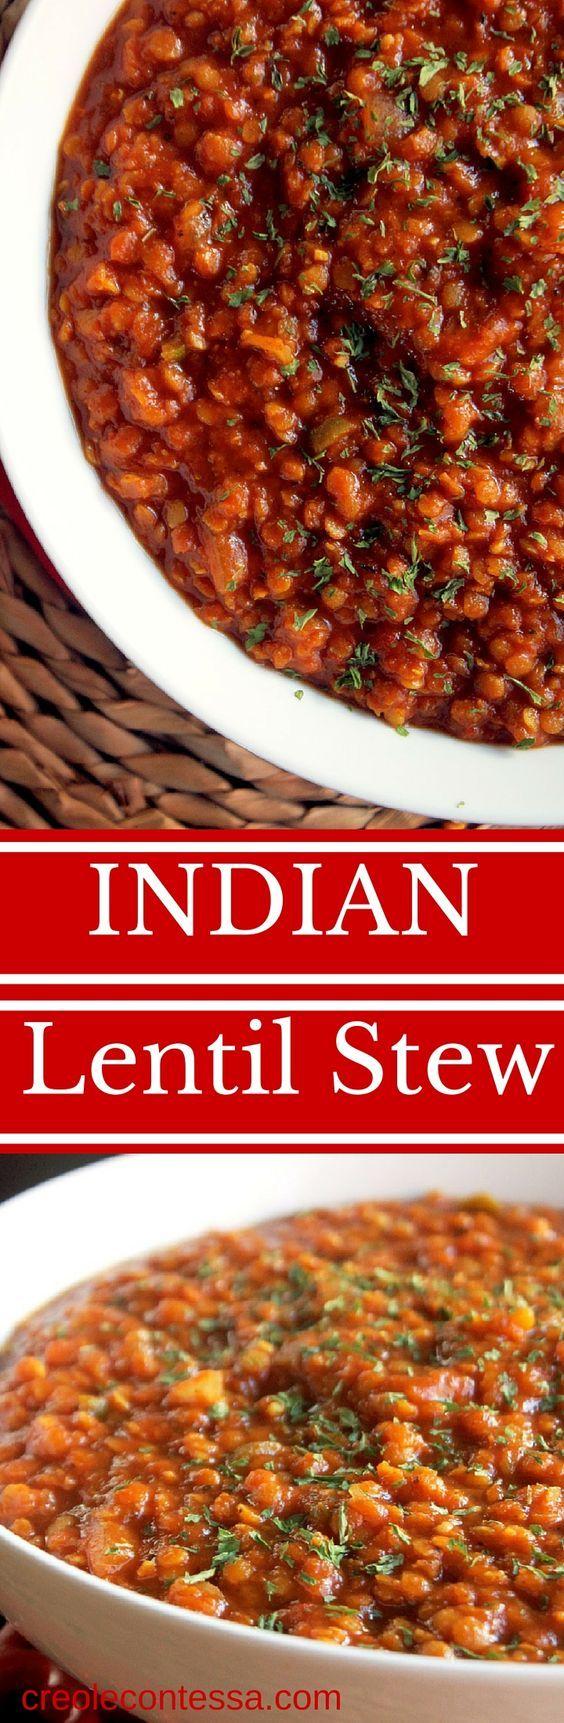 Slow Cooker Indian Lentil Stew-Creole Contessa  http://creolecontessa.com/2015/09/slow-cooker-indian-lentil-stew/  ingredients:  3 c red lentils 3 1/2 c crushed tomatoes 6 c veg broth 1 white onion  2 cloves garlic  3 Serrano chili  1 T creole seasoning 1 T garlic powder 1 T onion powder 1/2 T black pepper 1/2 T curry powder 1/2 T paprika 1/2 T chili powder 1/2 T garam masala powder 1/2 T turmeric   1/2 T ginger powder 2 T cilantro (garnish)